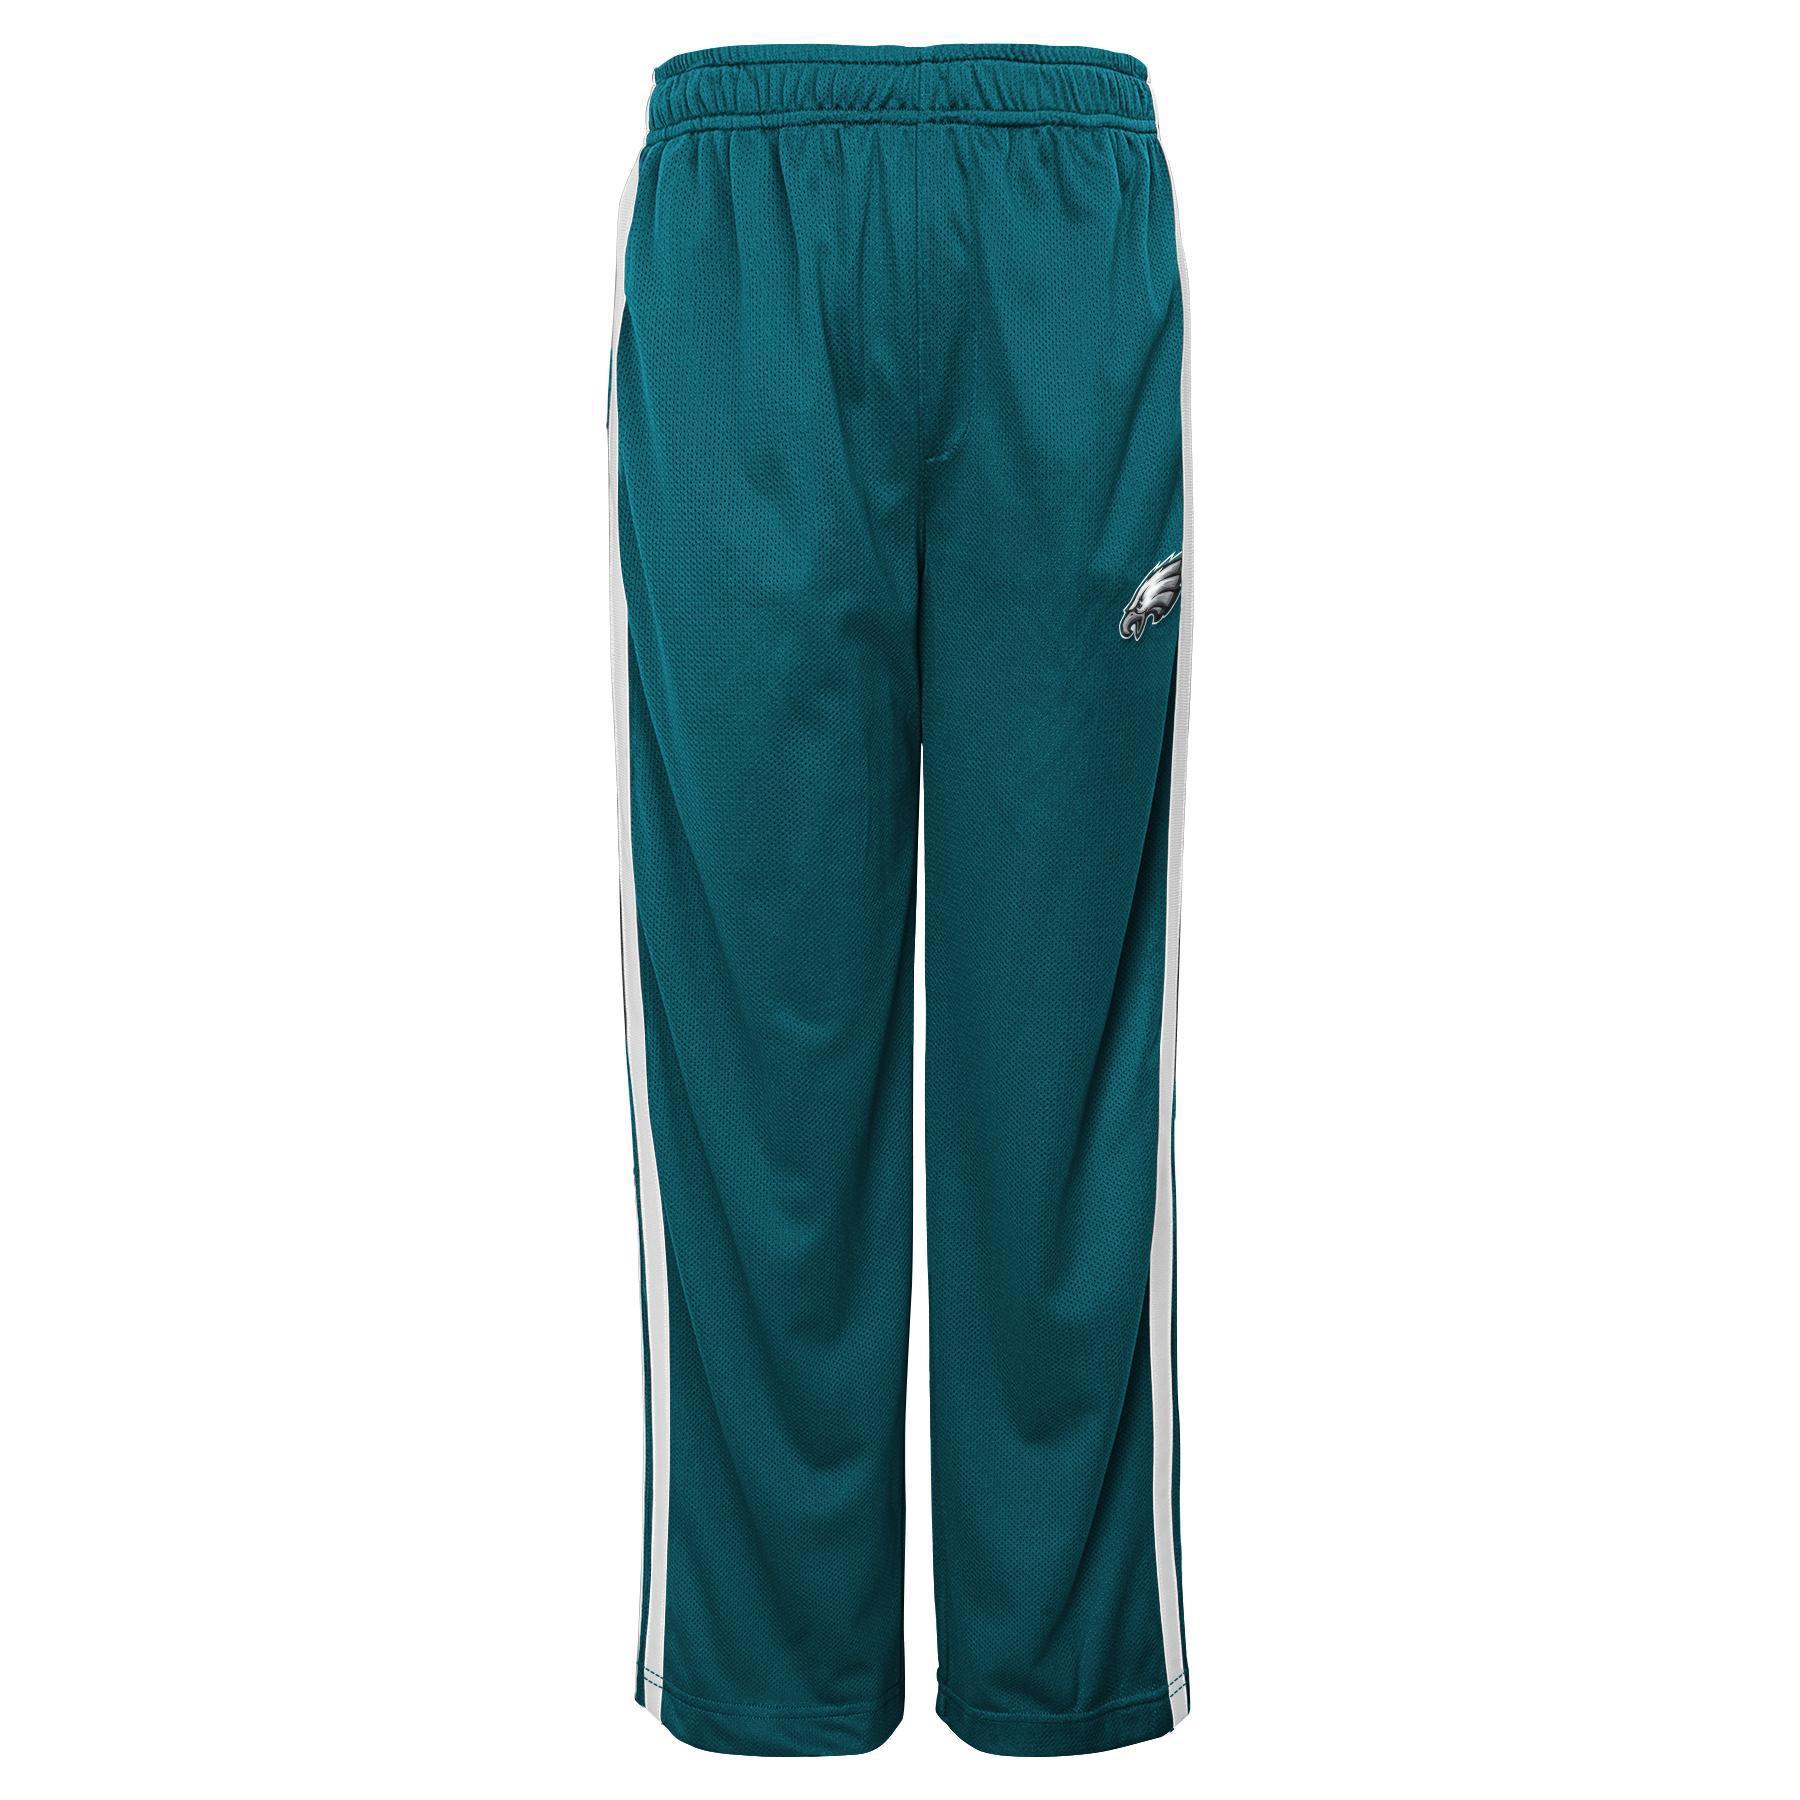 Boys' Athletic Pants - Philadelphia Eagles